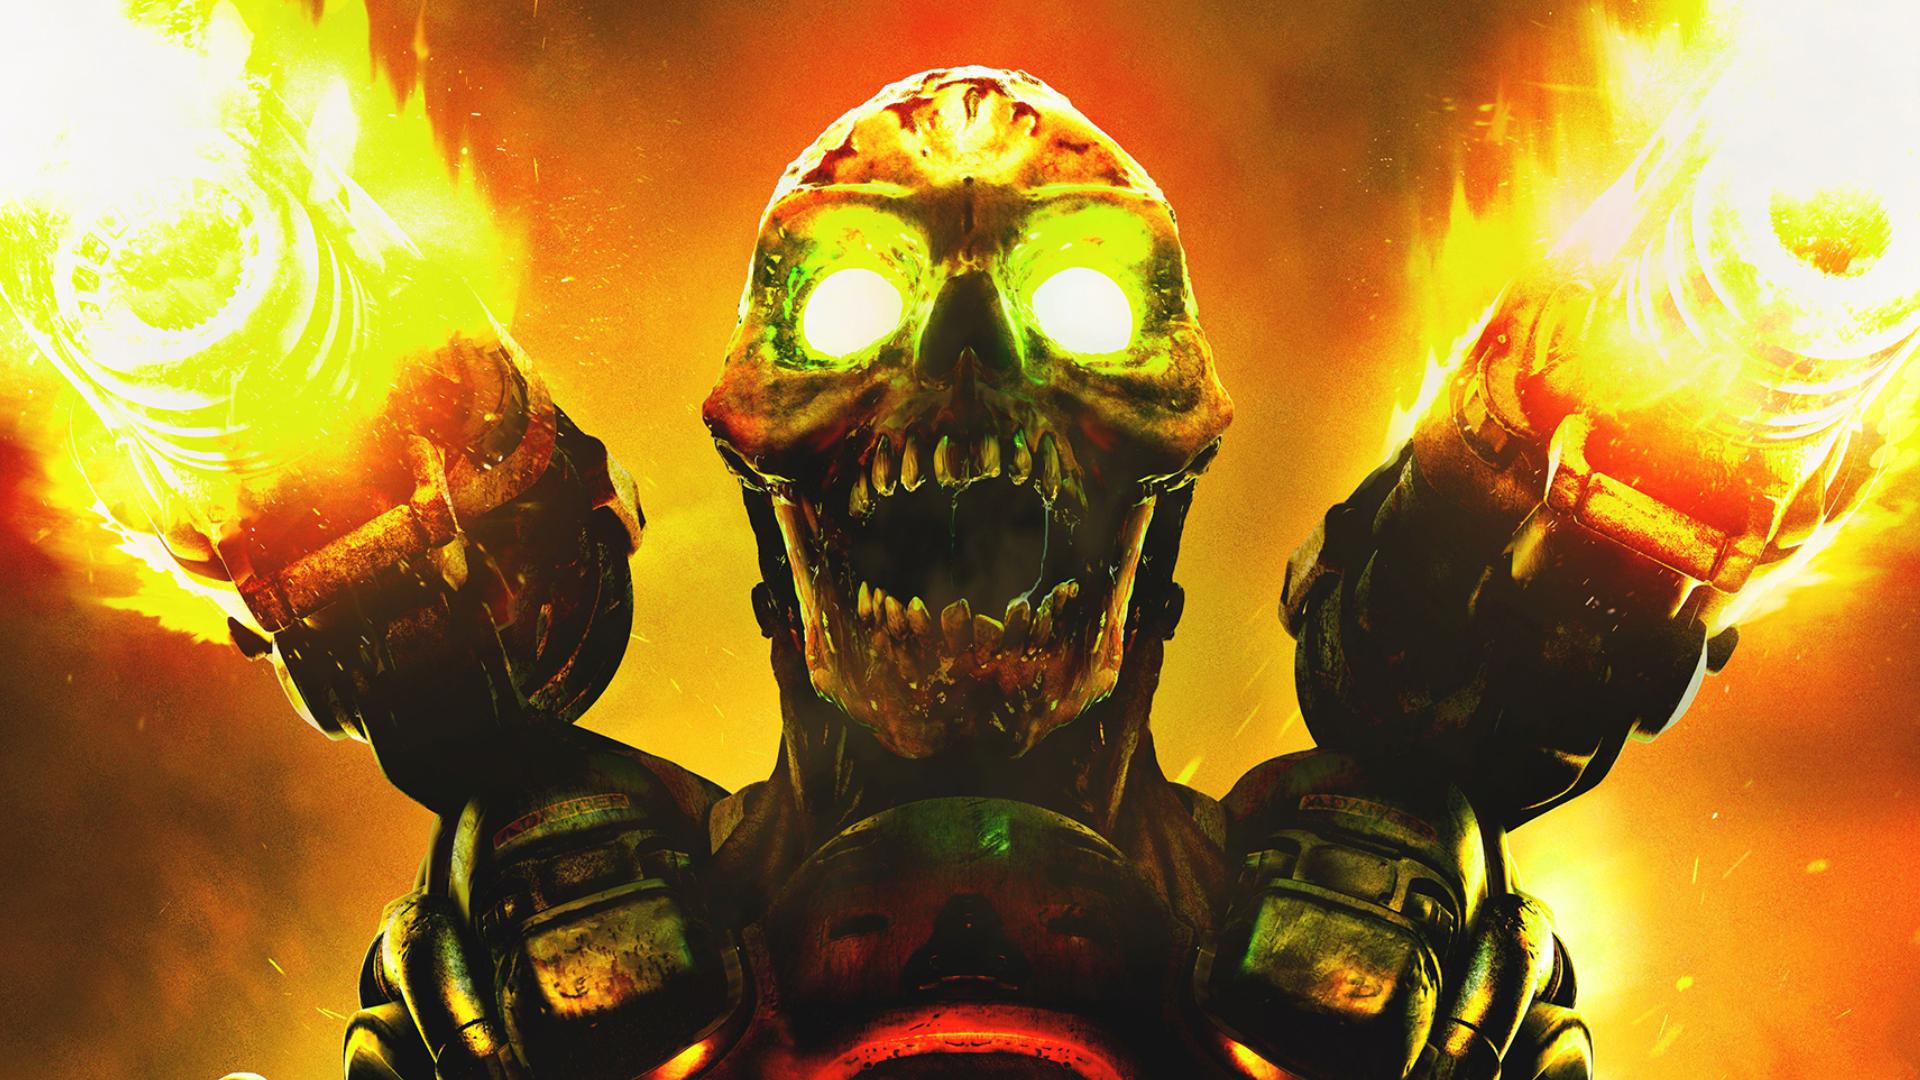 Wallpaper from the new #DOOM Revenant   Synth   Doom game